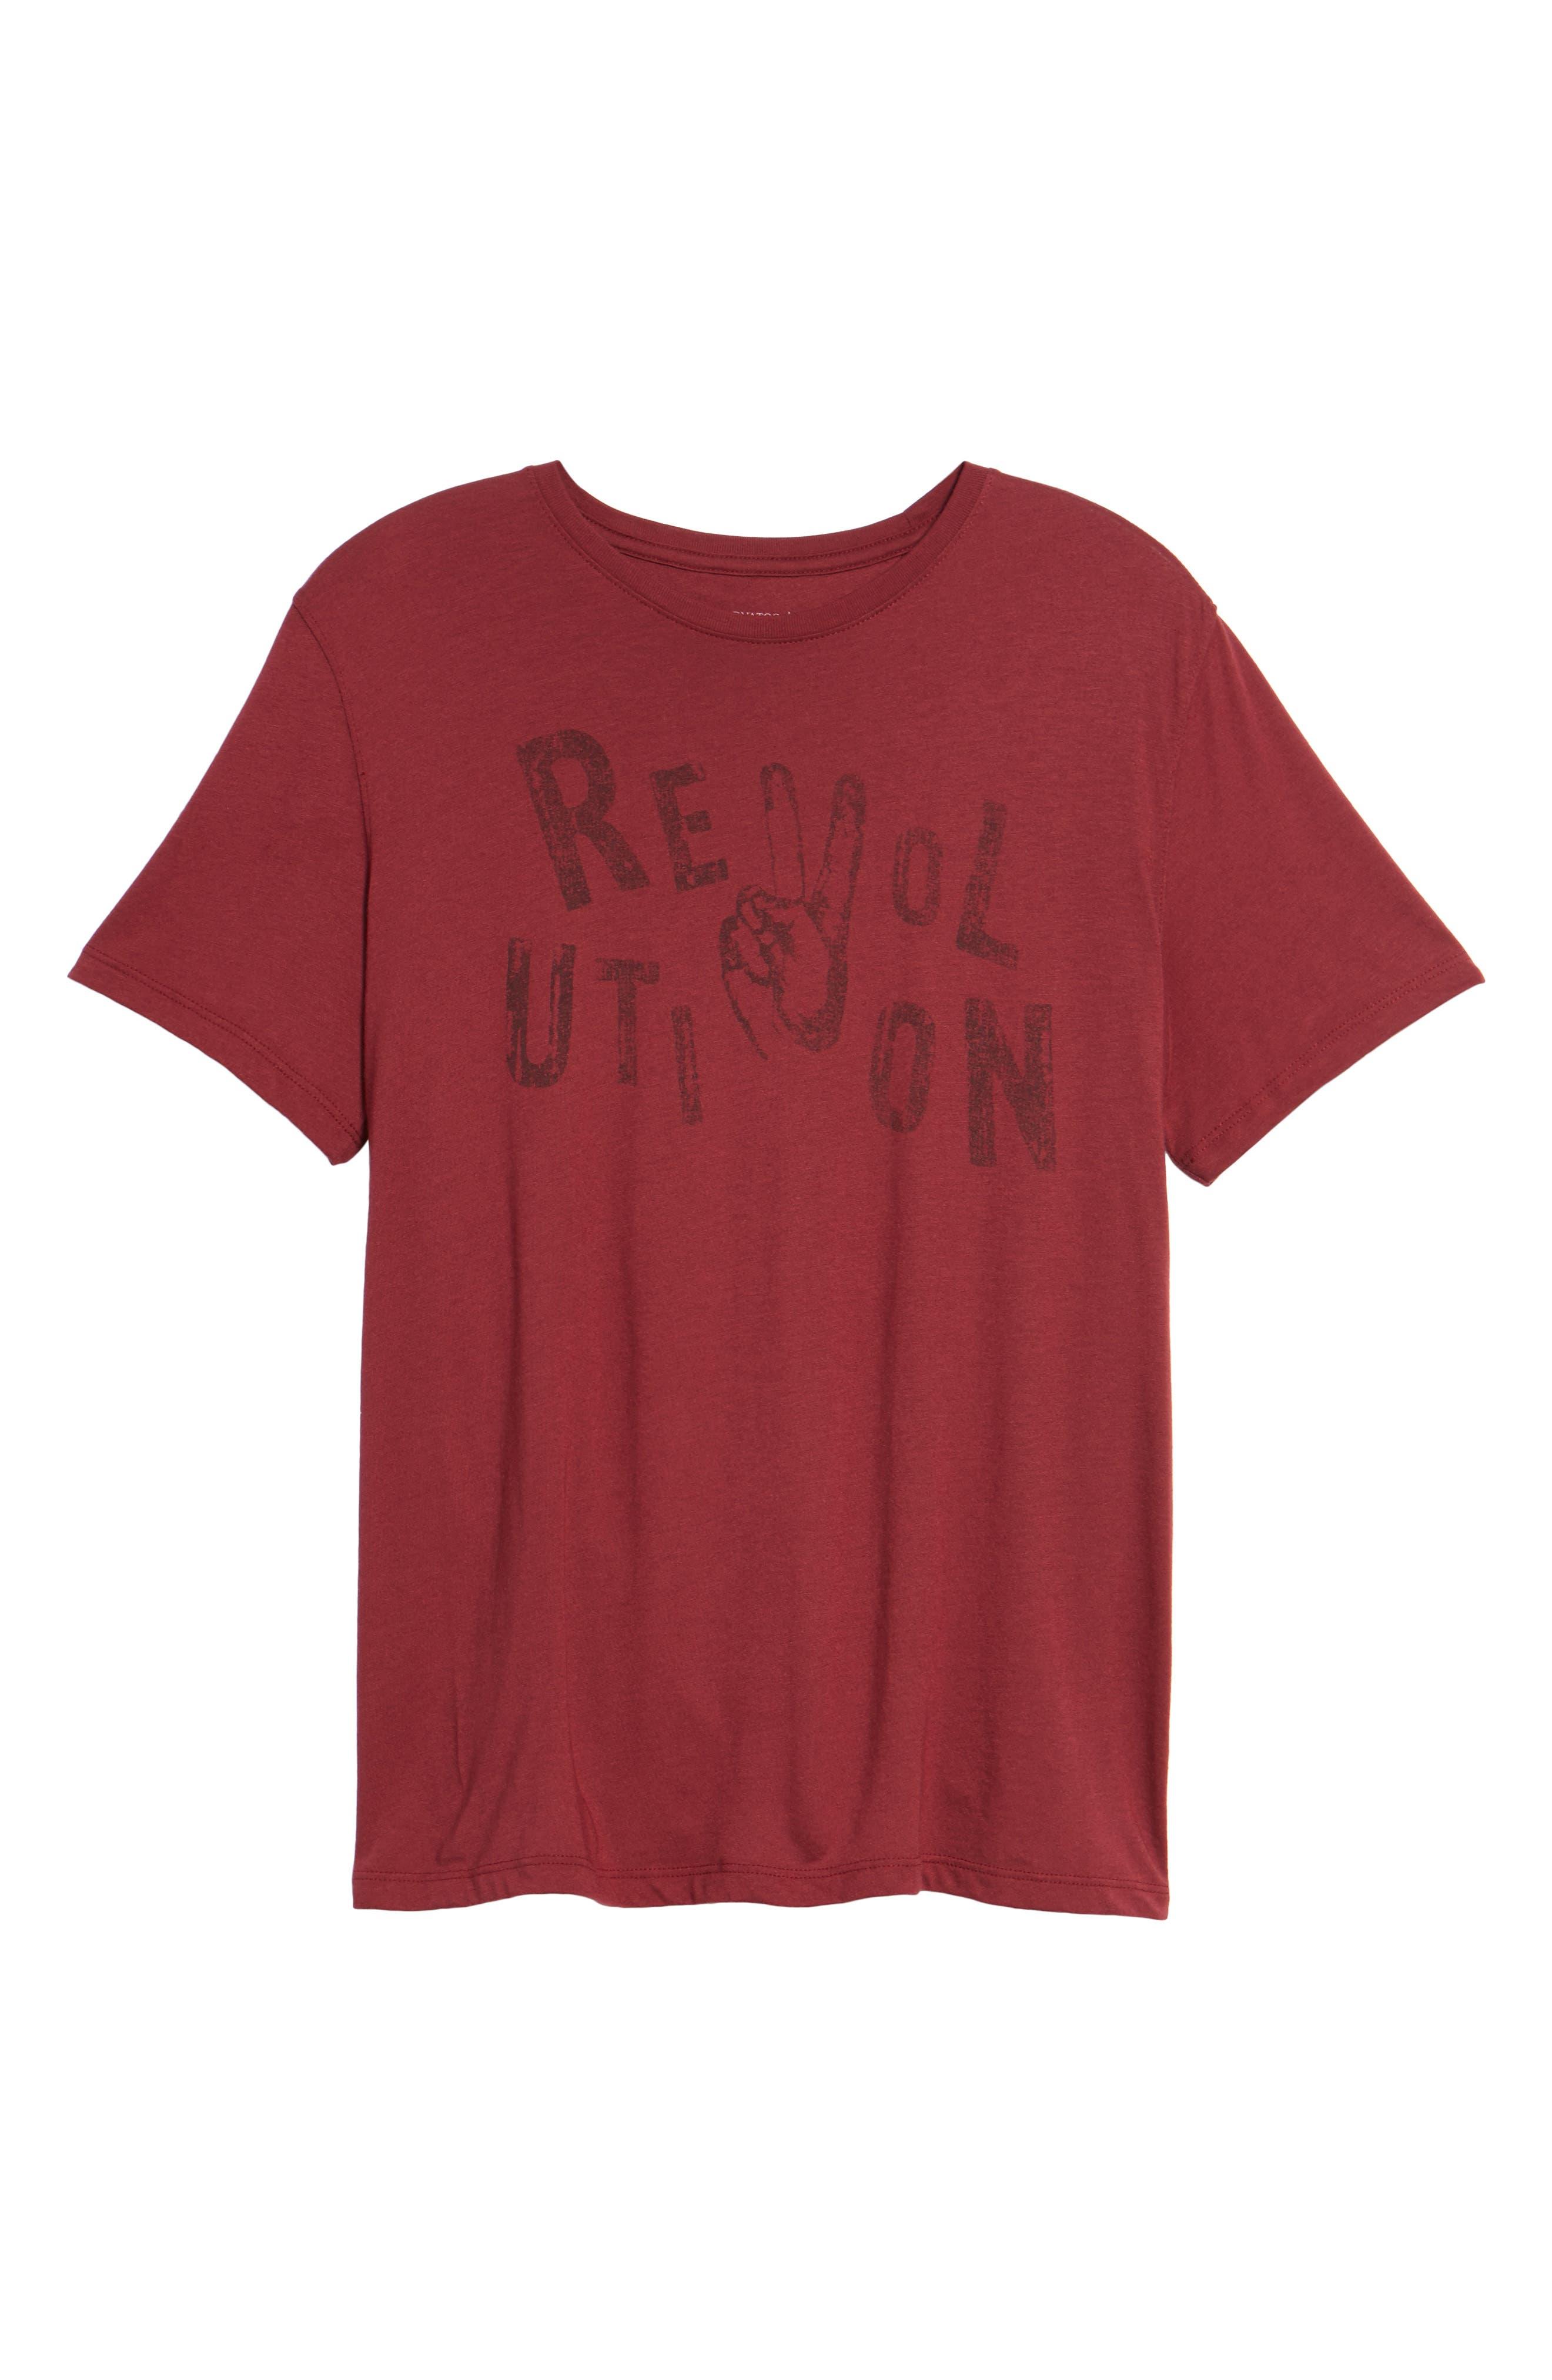 Revolution Graphic T-Shirt,                             Alternate thumbnail 12, color,